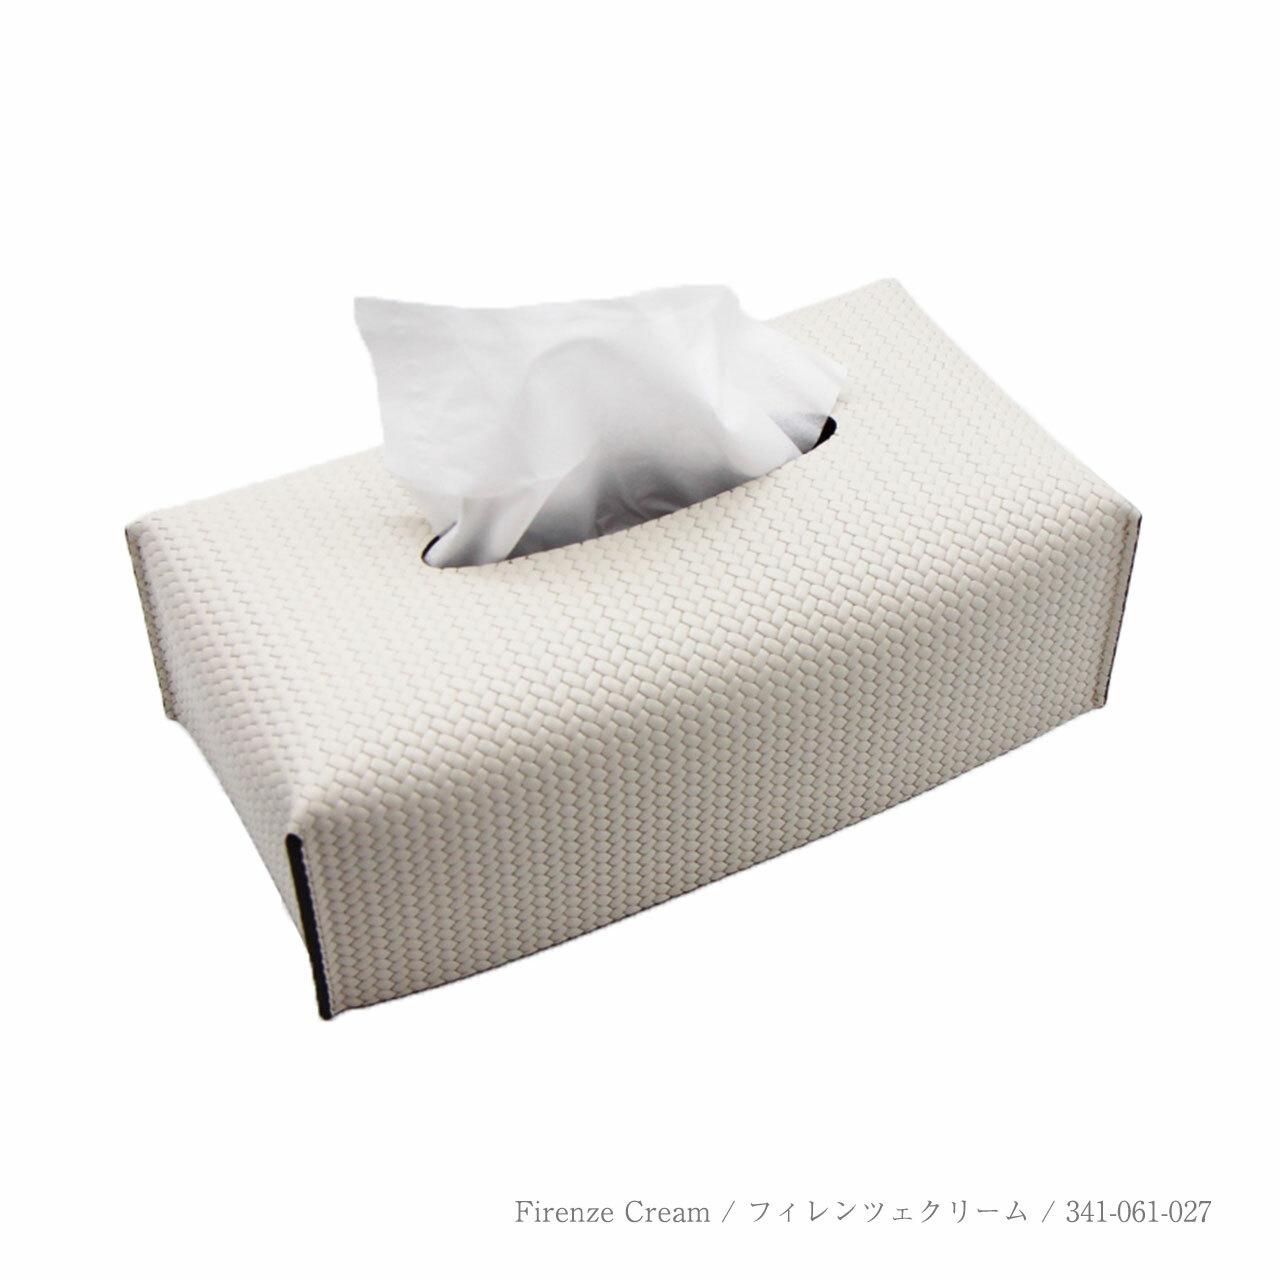 Pinetti Tissue Box / Firenze(ピネッティ ティッシュボックス/フィレンツェ)341-061